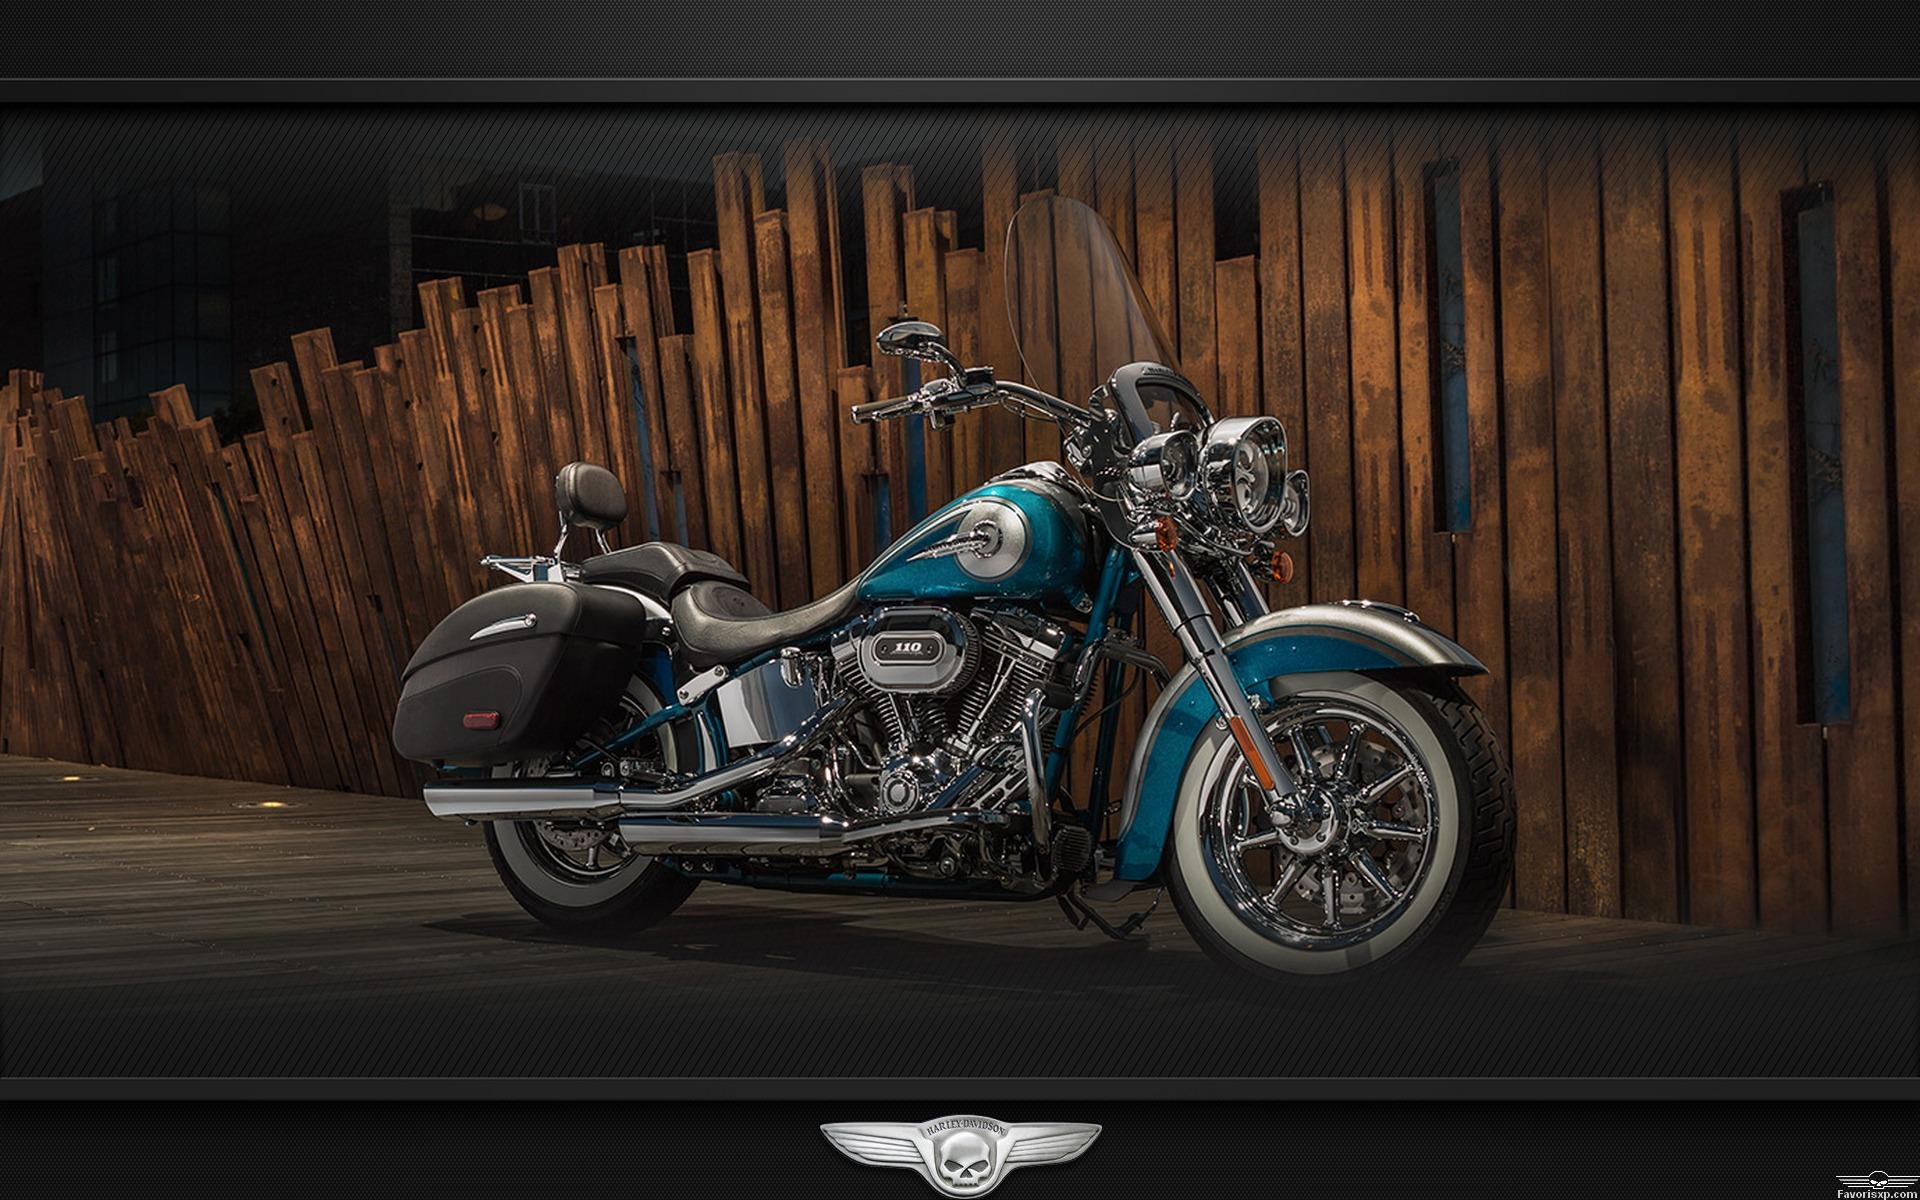 Fond d'écran de Harley Davidson.